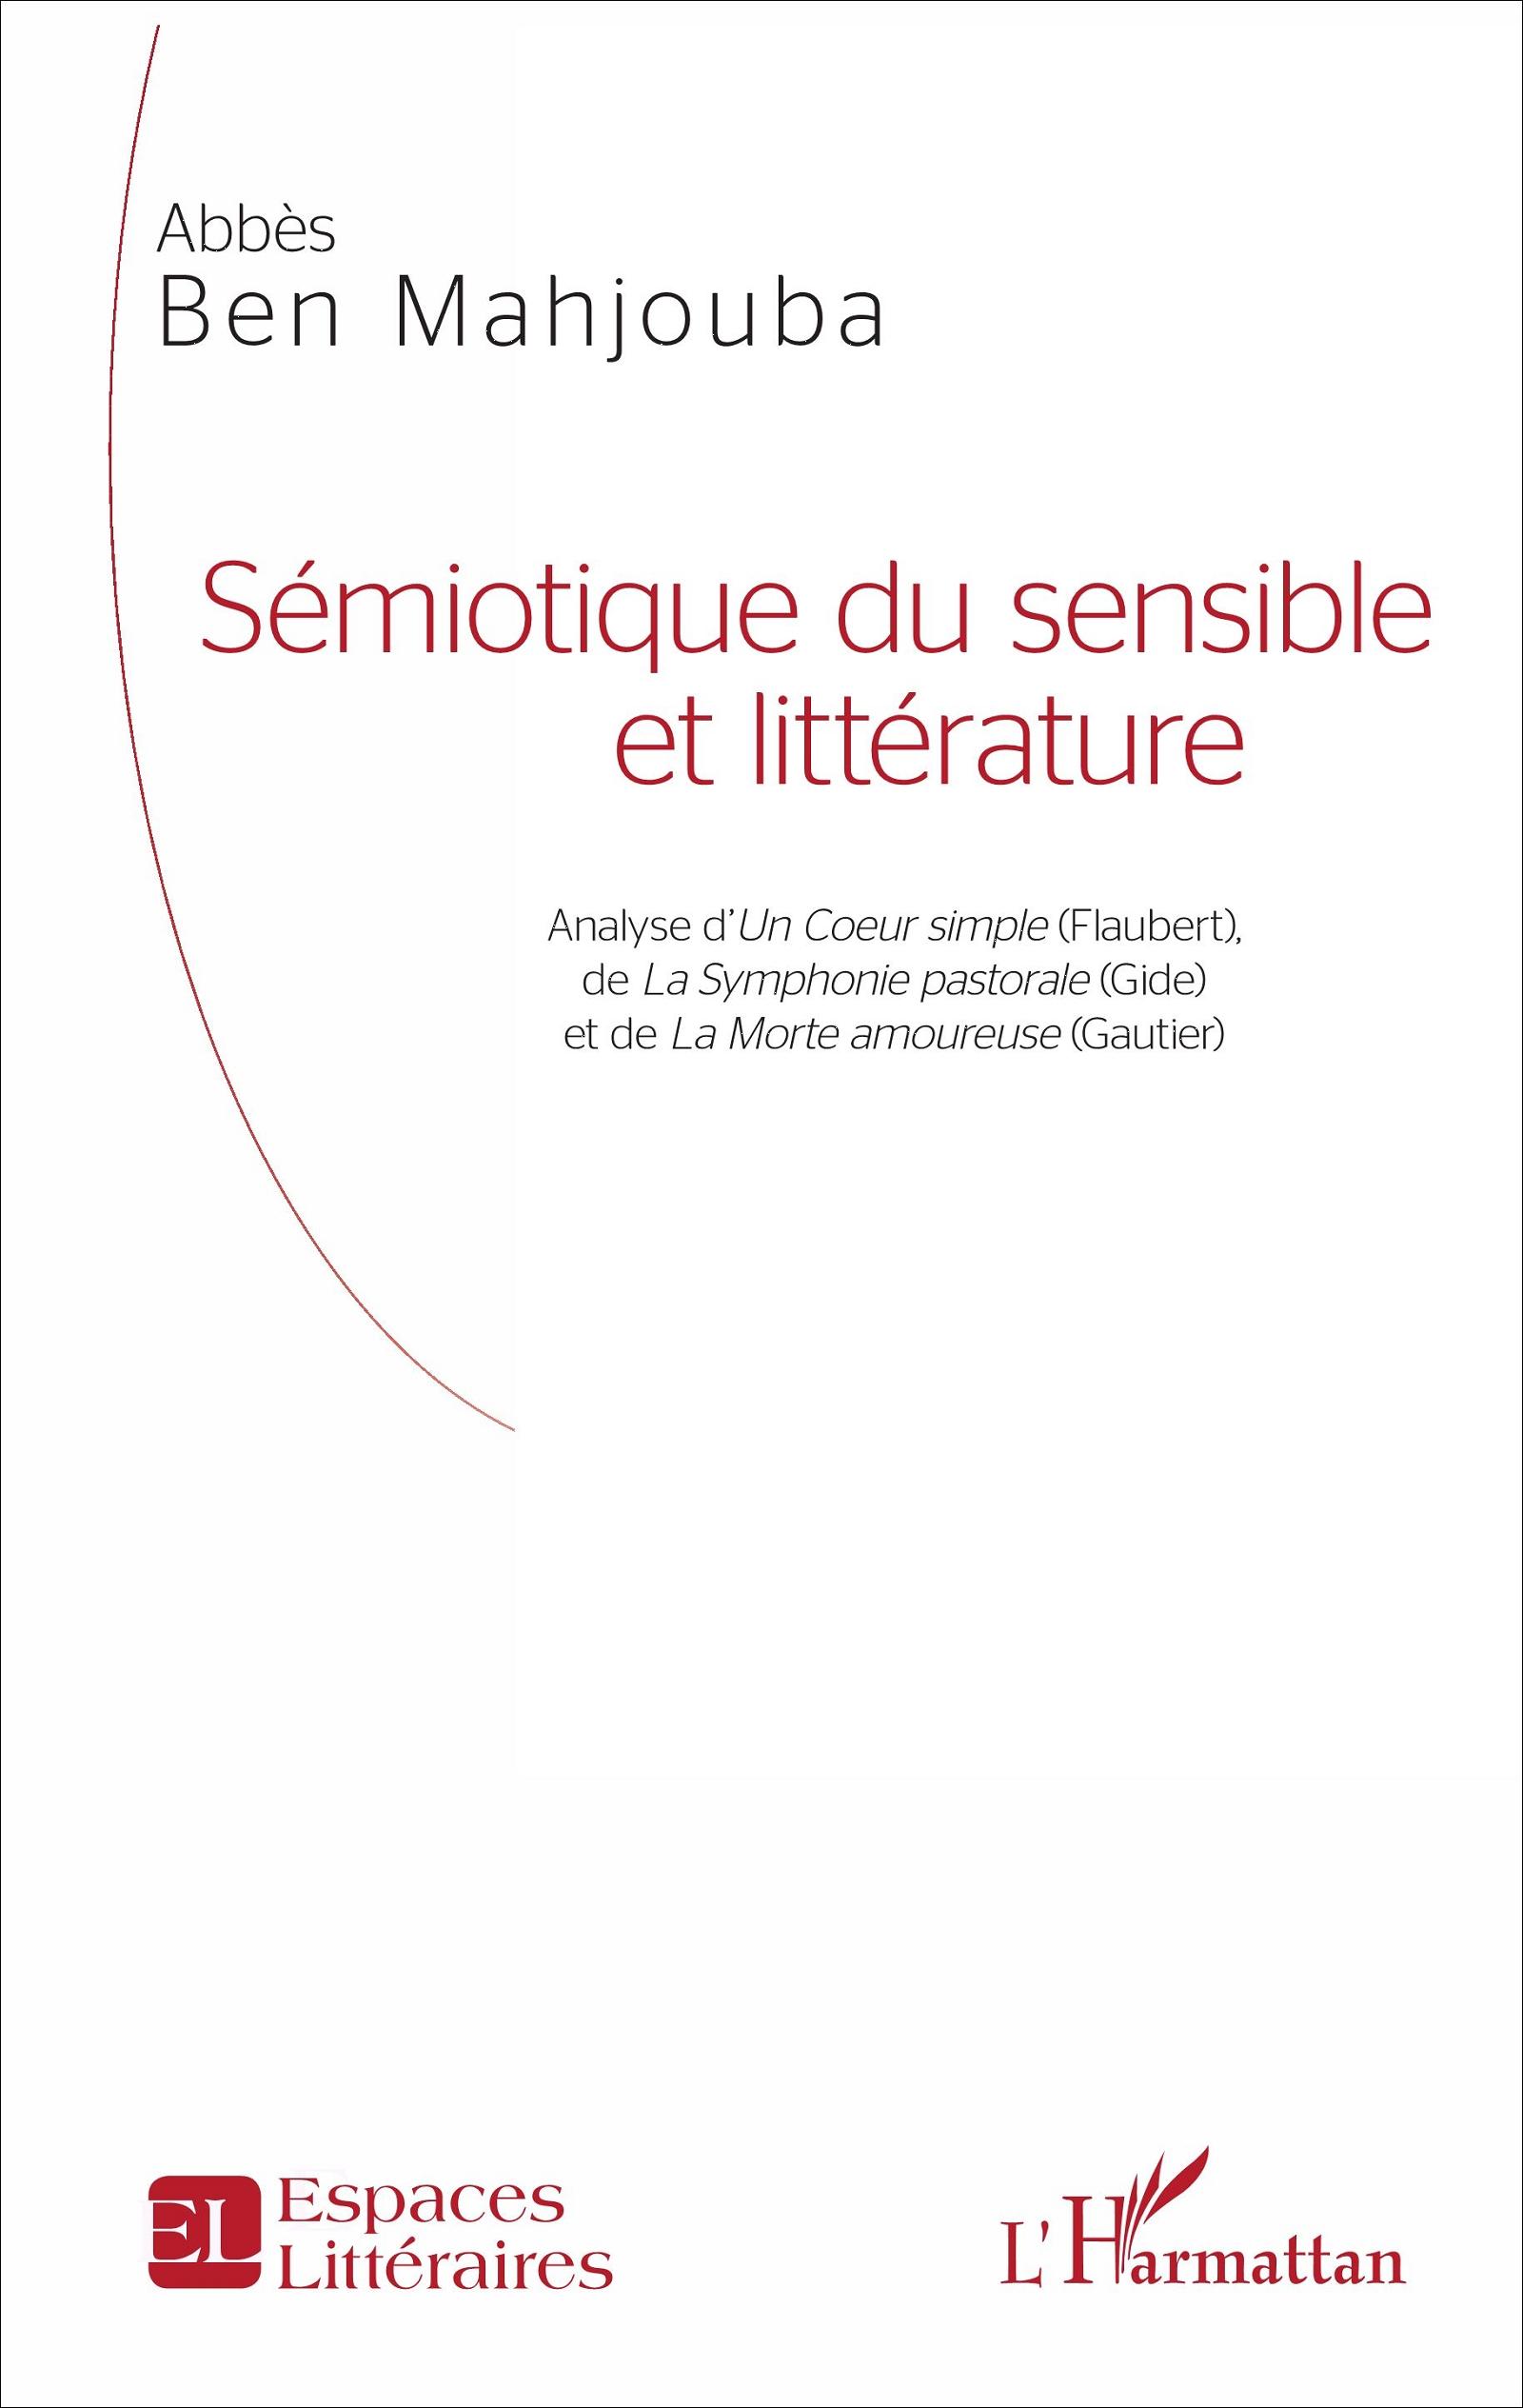 A. Ben Mahjouba, Sémiotique du sensible et littérature